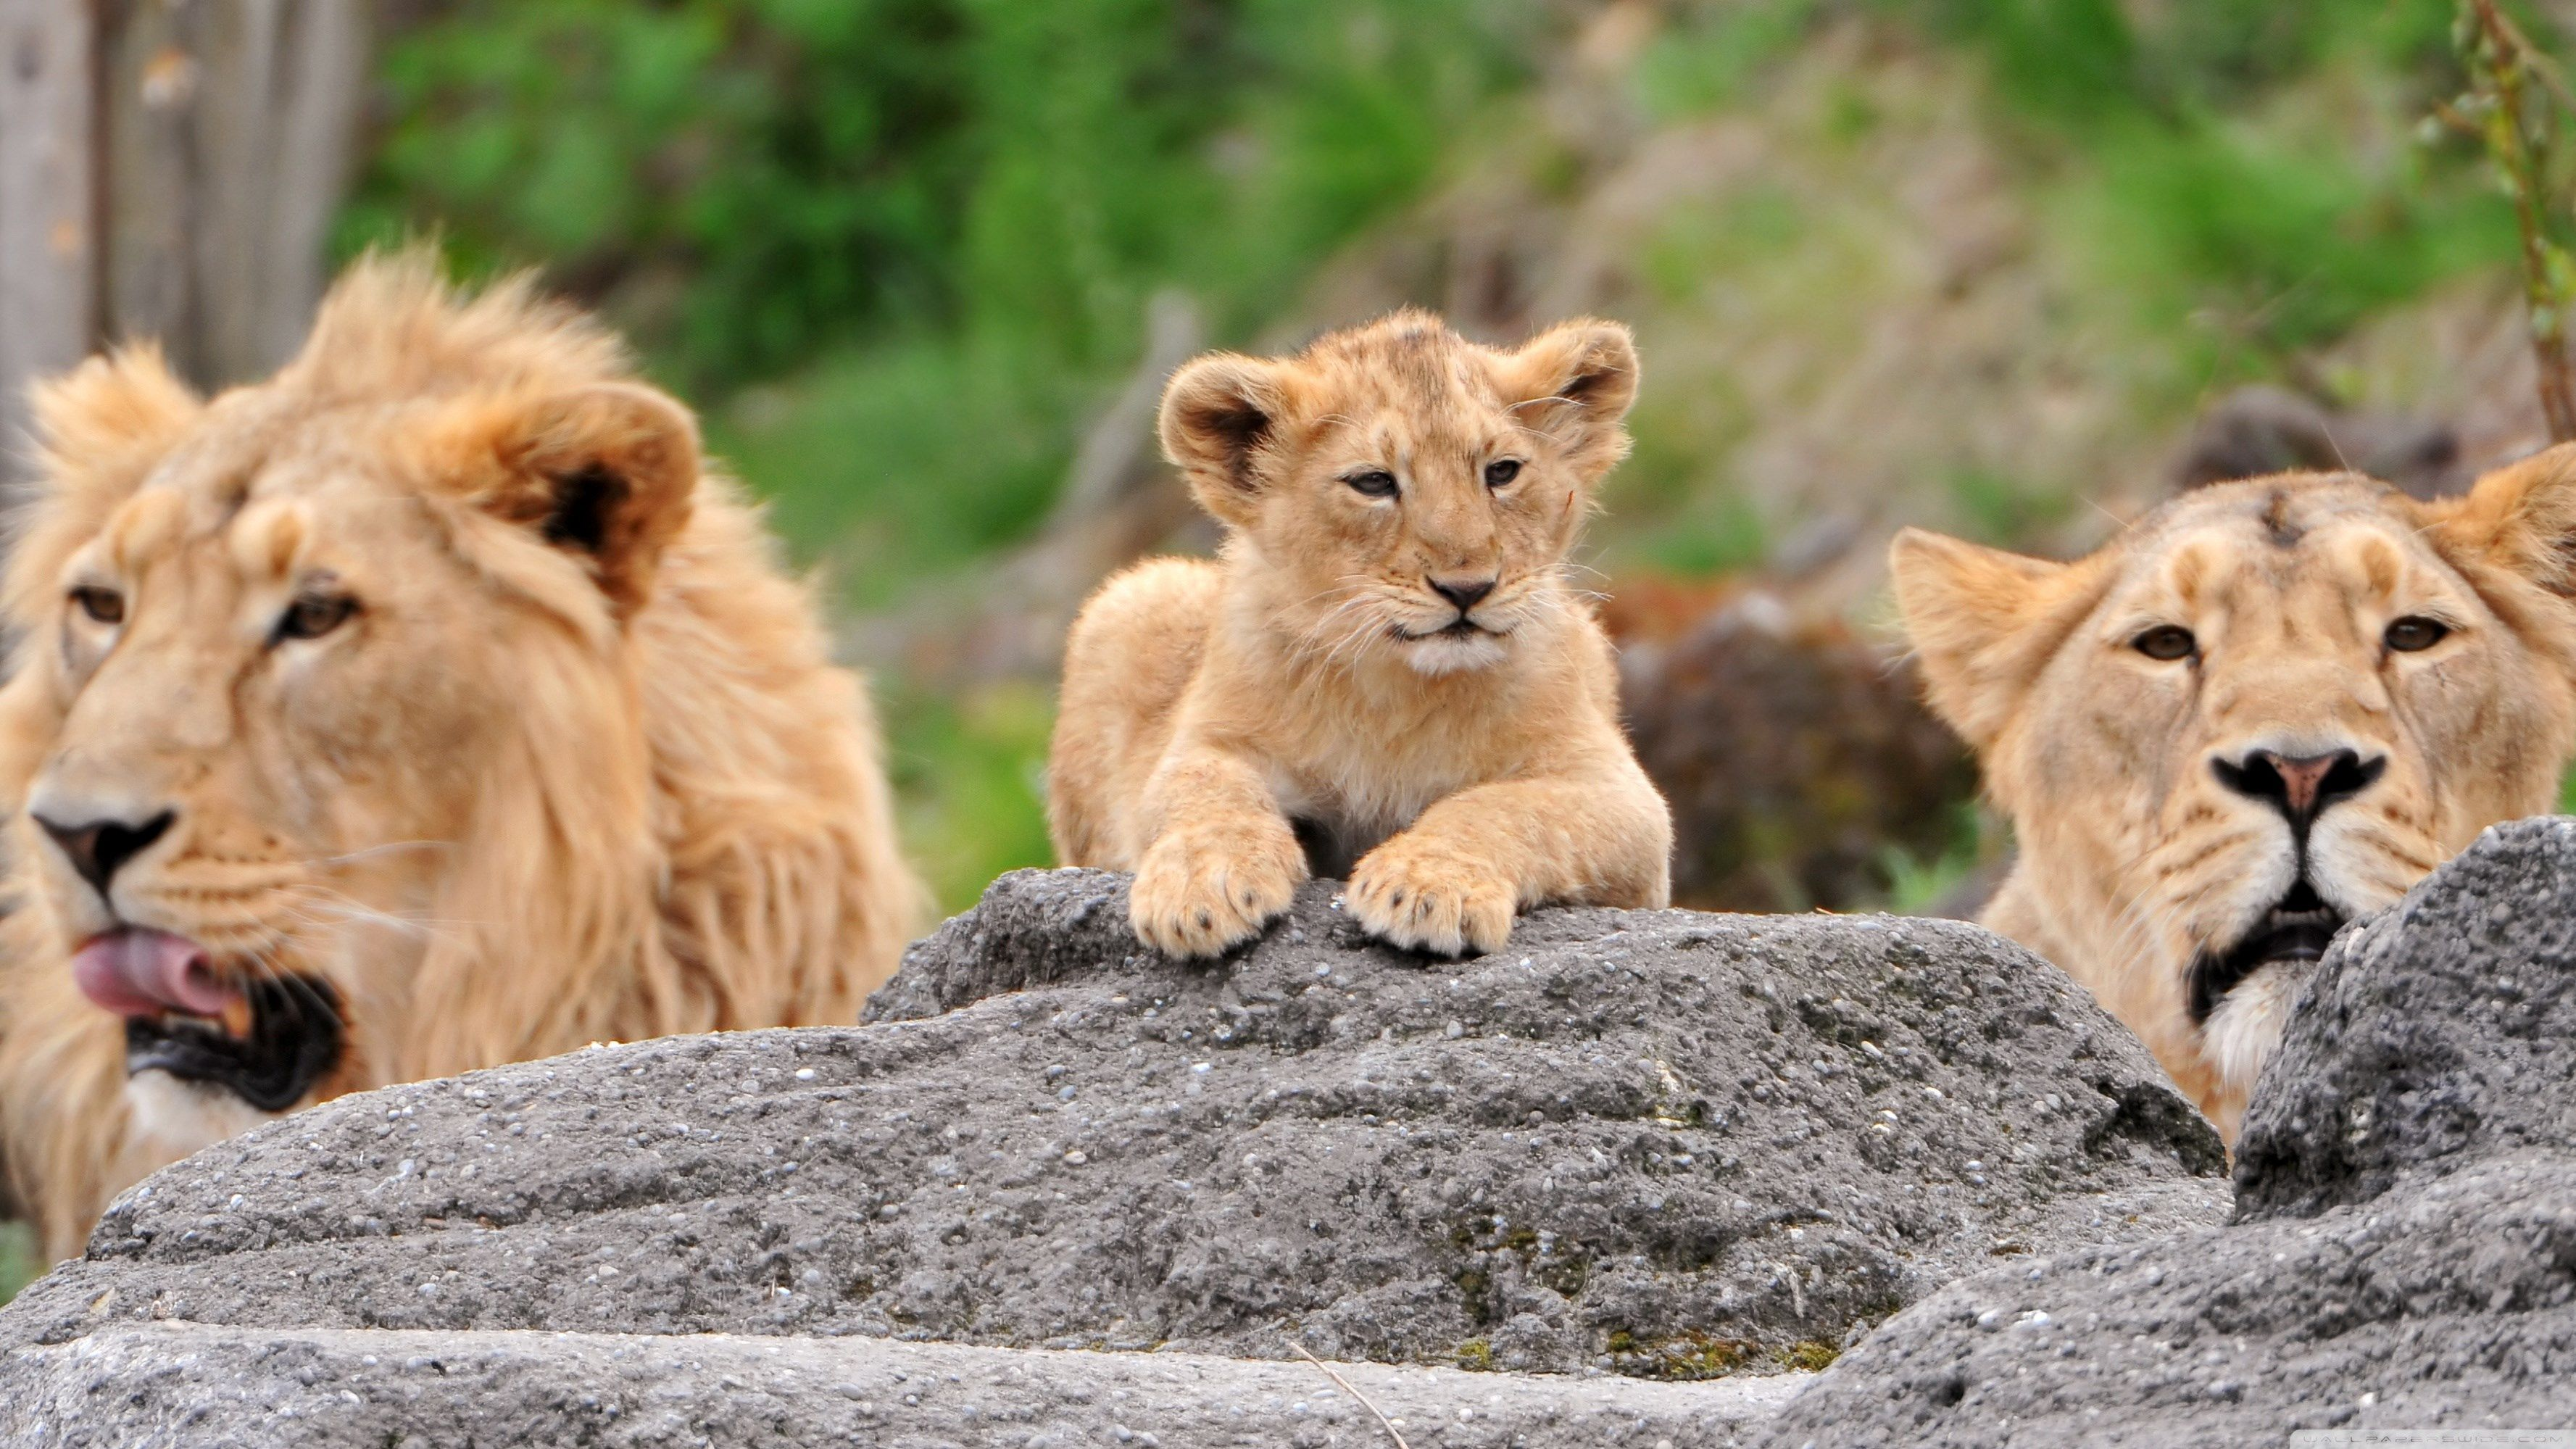 lion images background (Ayers Gordon 3554x1999)